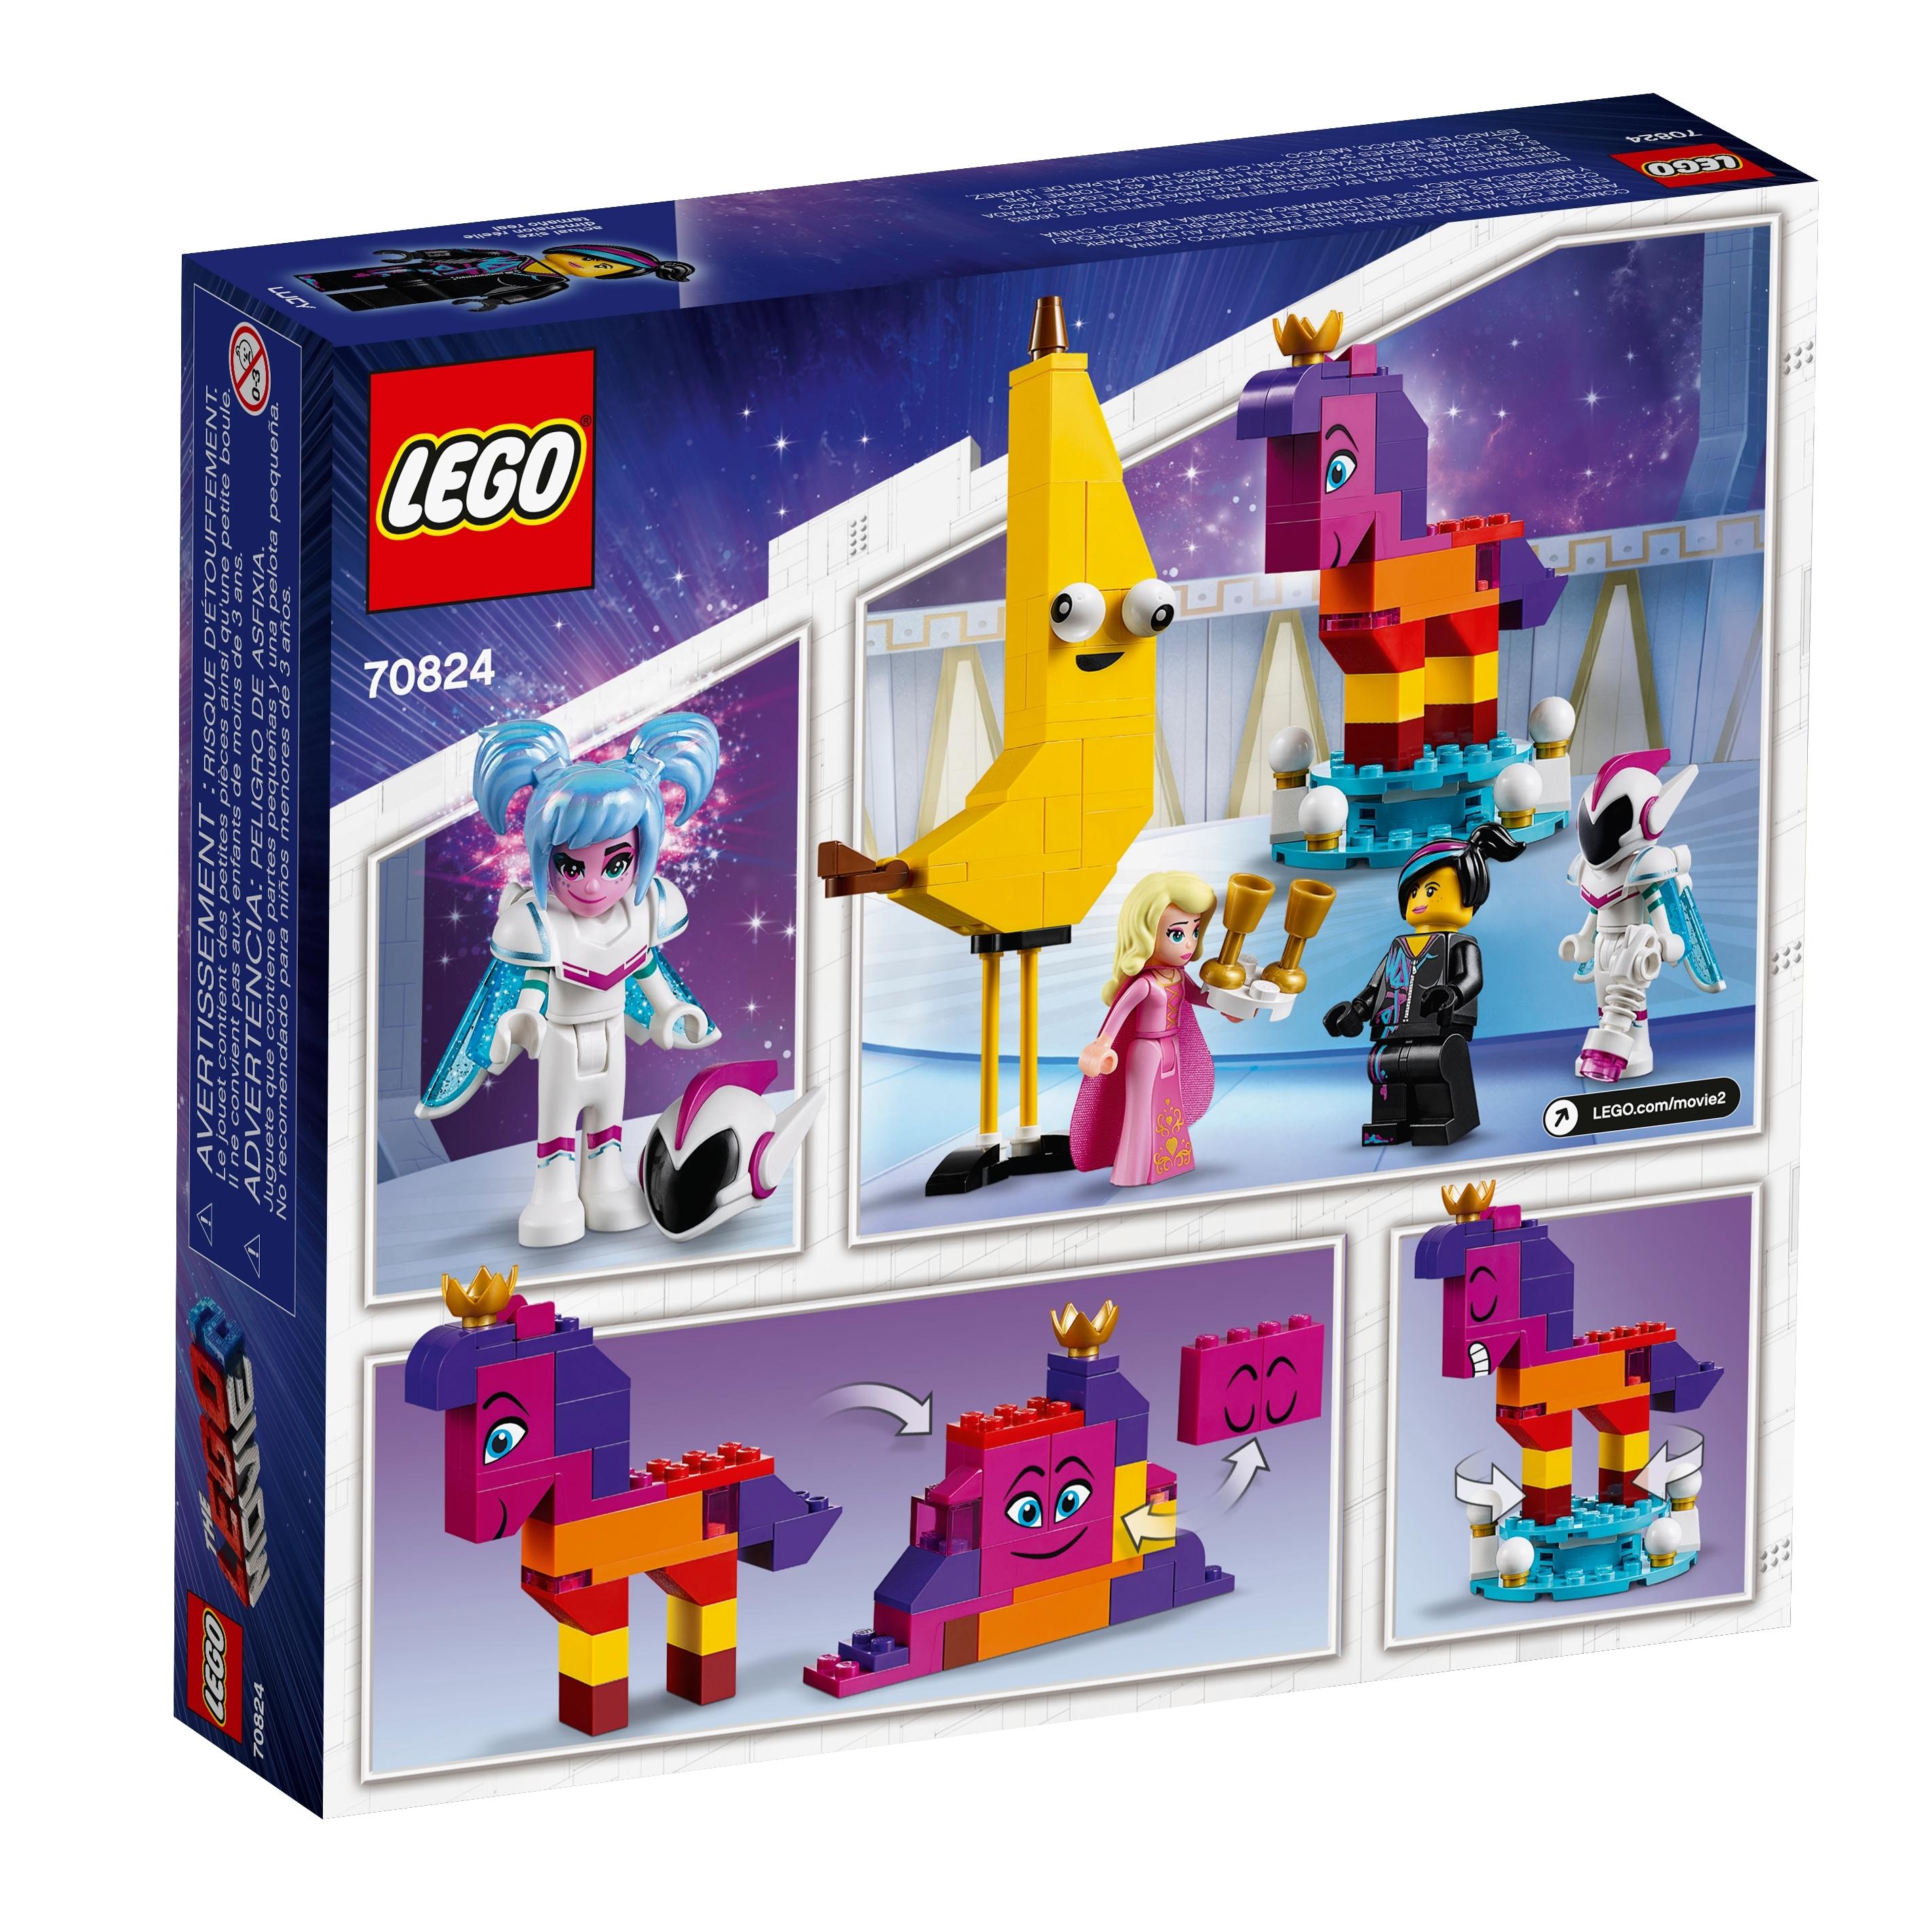 NEW LEGO Movie 2 Minifigure Queen Watevra Wa/'Nabi character 70824 minifig parts